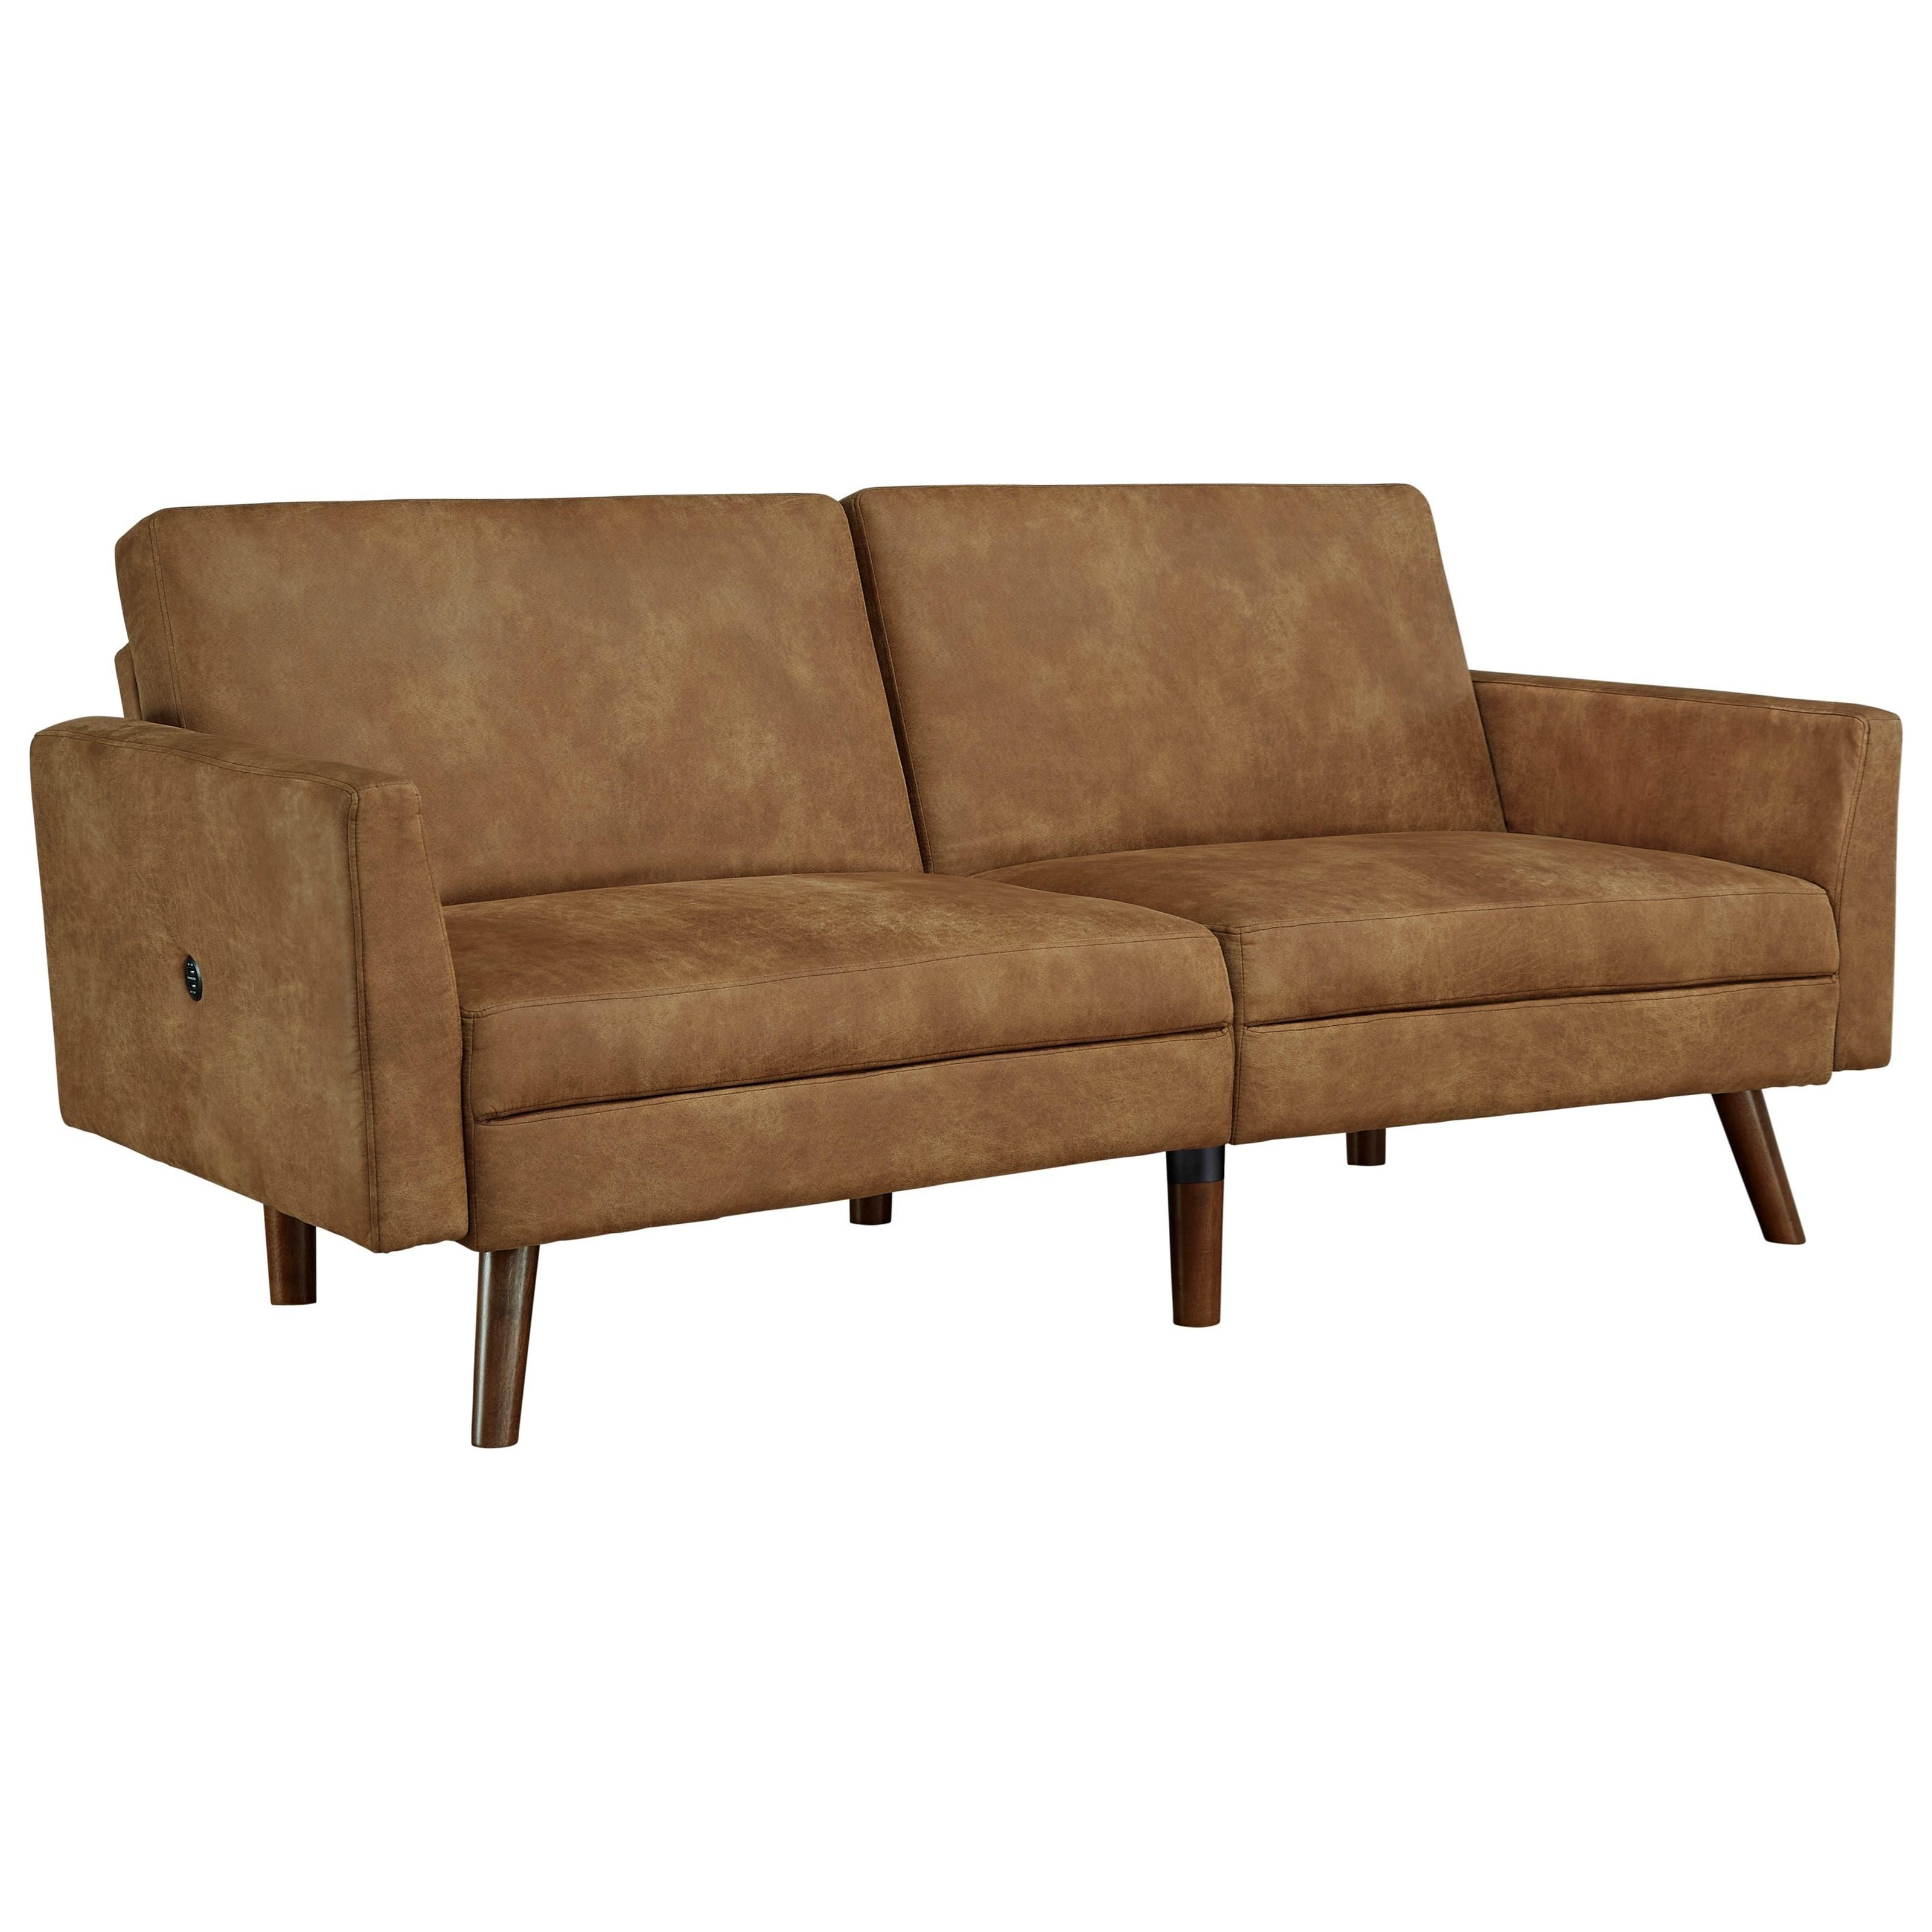 Drescher Flip Flop Sofa by Signature Design by Ashley at Furniture Barn